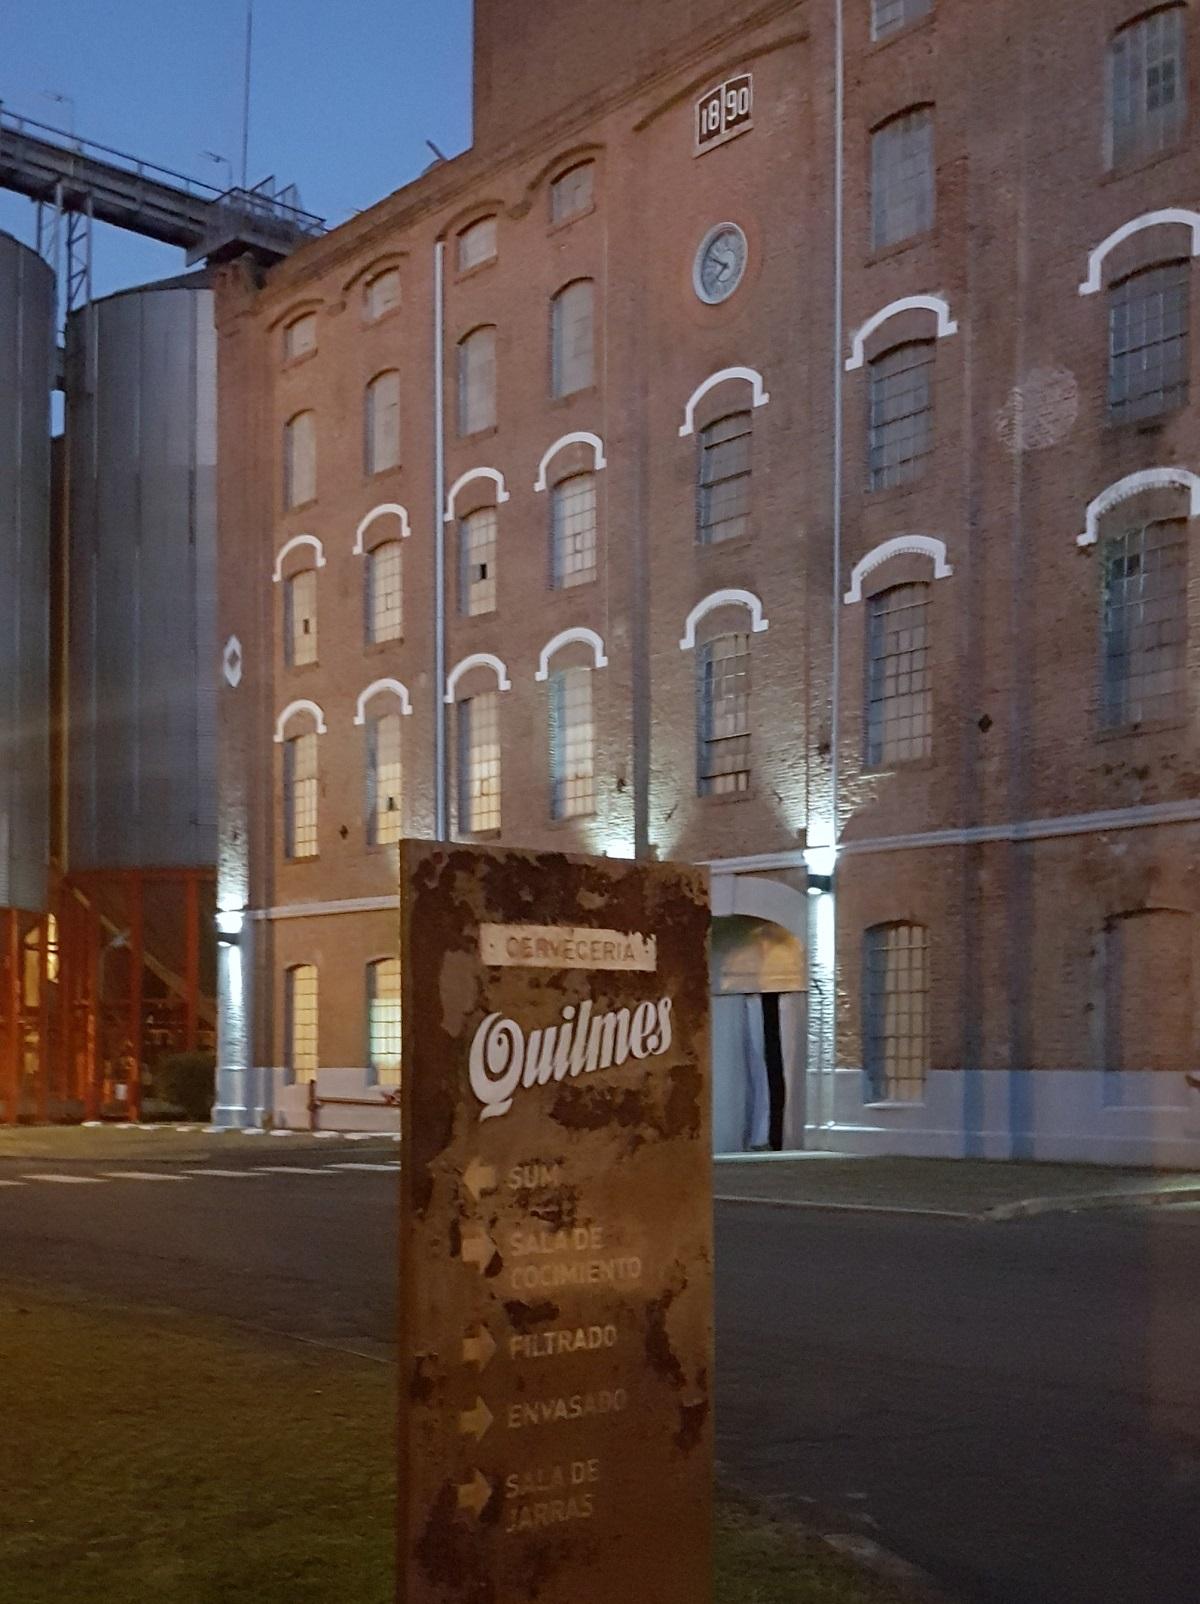 birra argentina quilmes storia azienda qualità